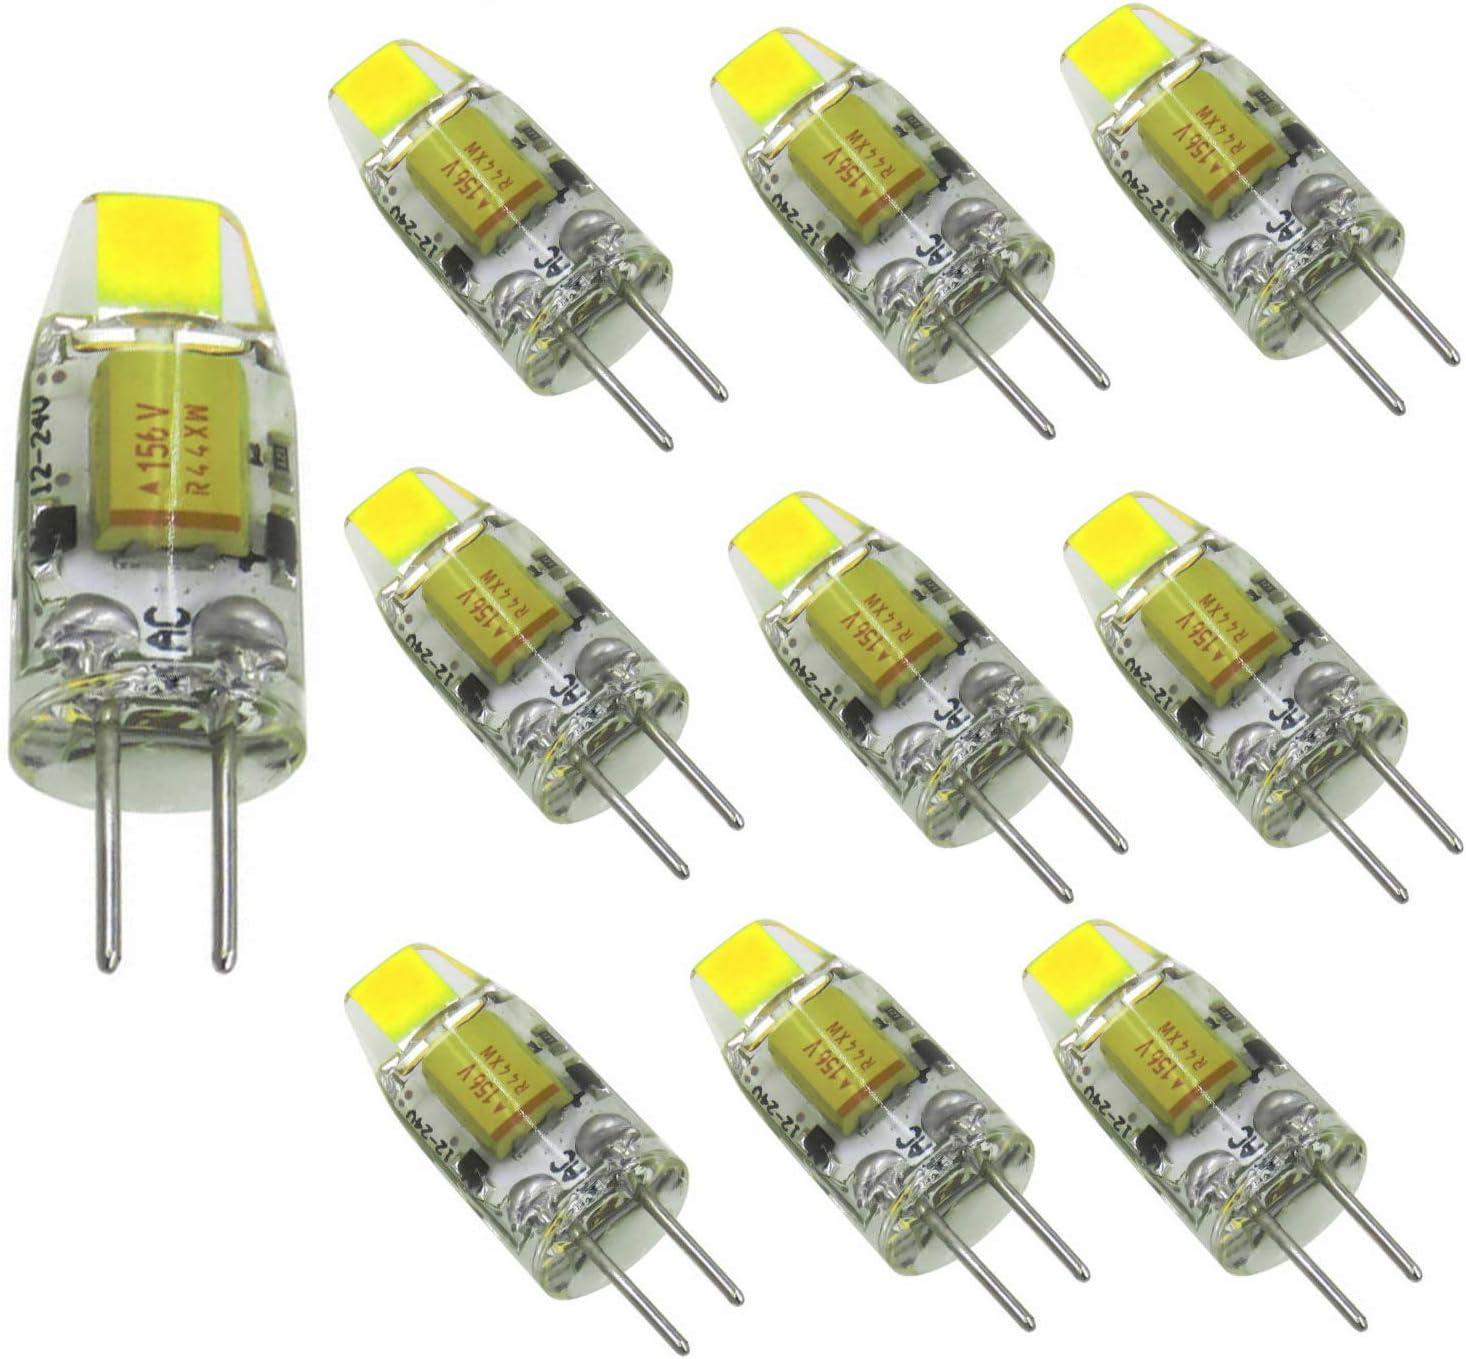 aiyowei paquete de 10 piezas, BI-PIN - Mini Bombilla G4 LED 12 V-24 V DC 1W COB 0705 SMD blanco 6000K